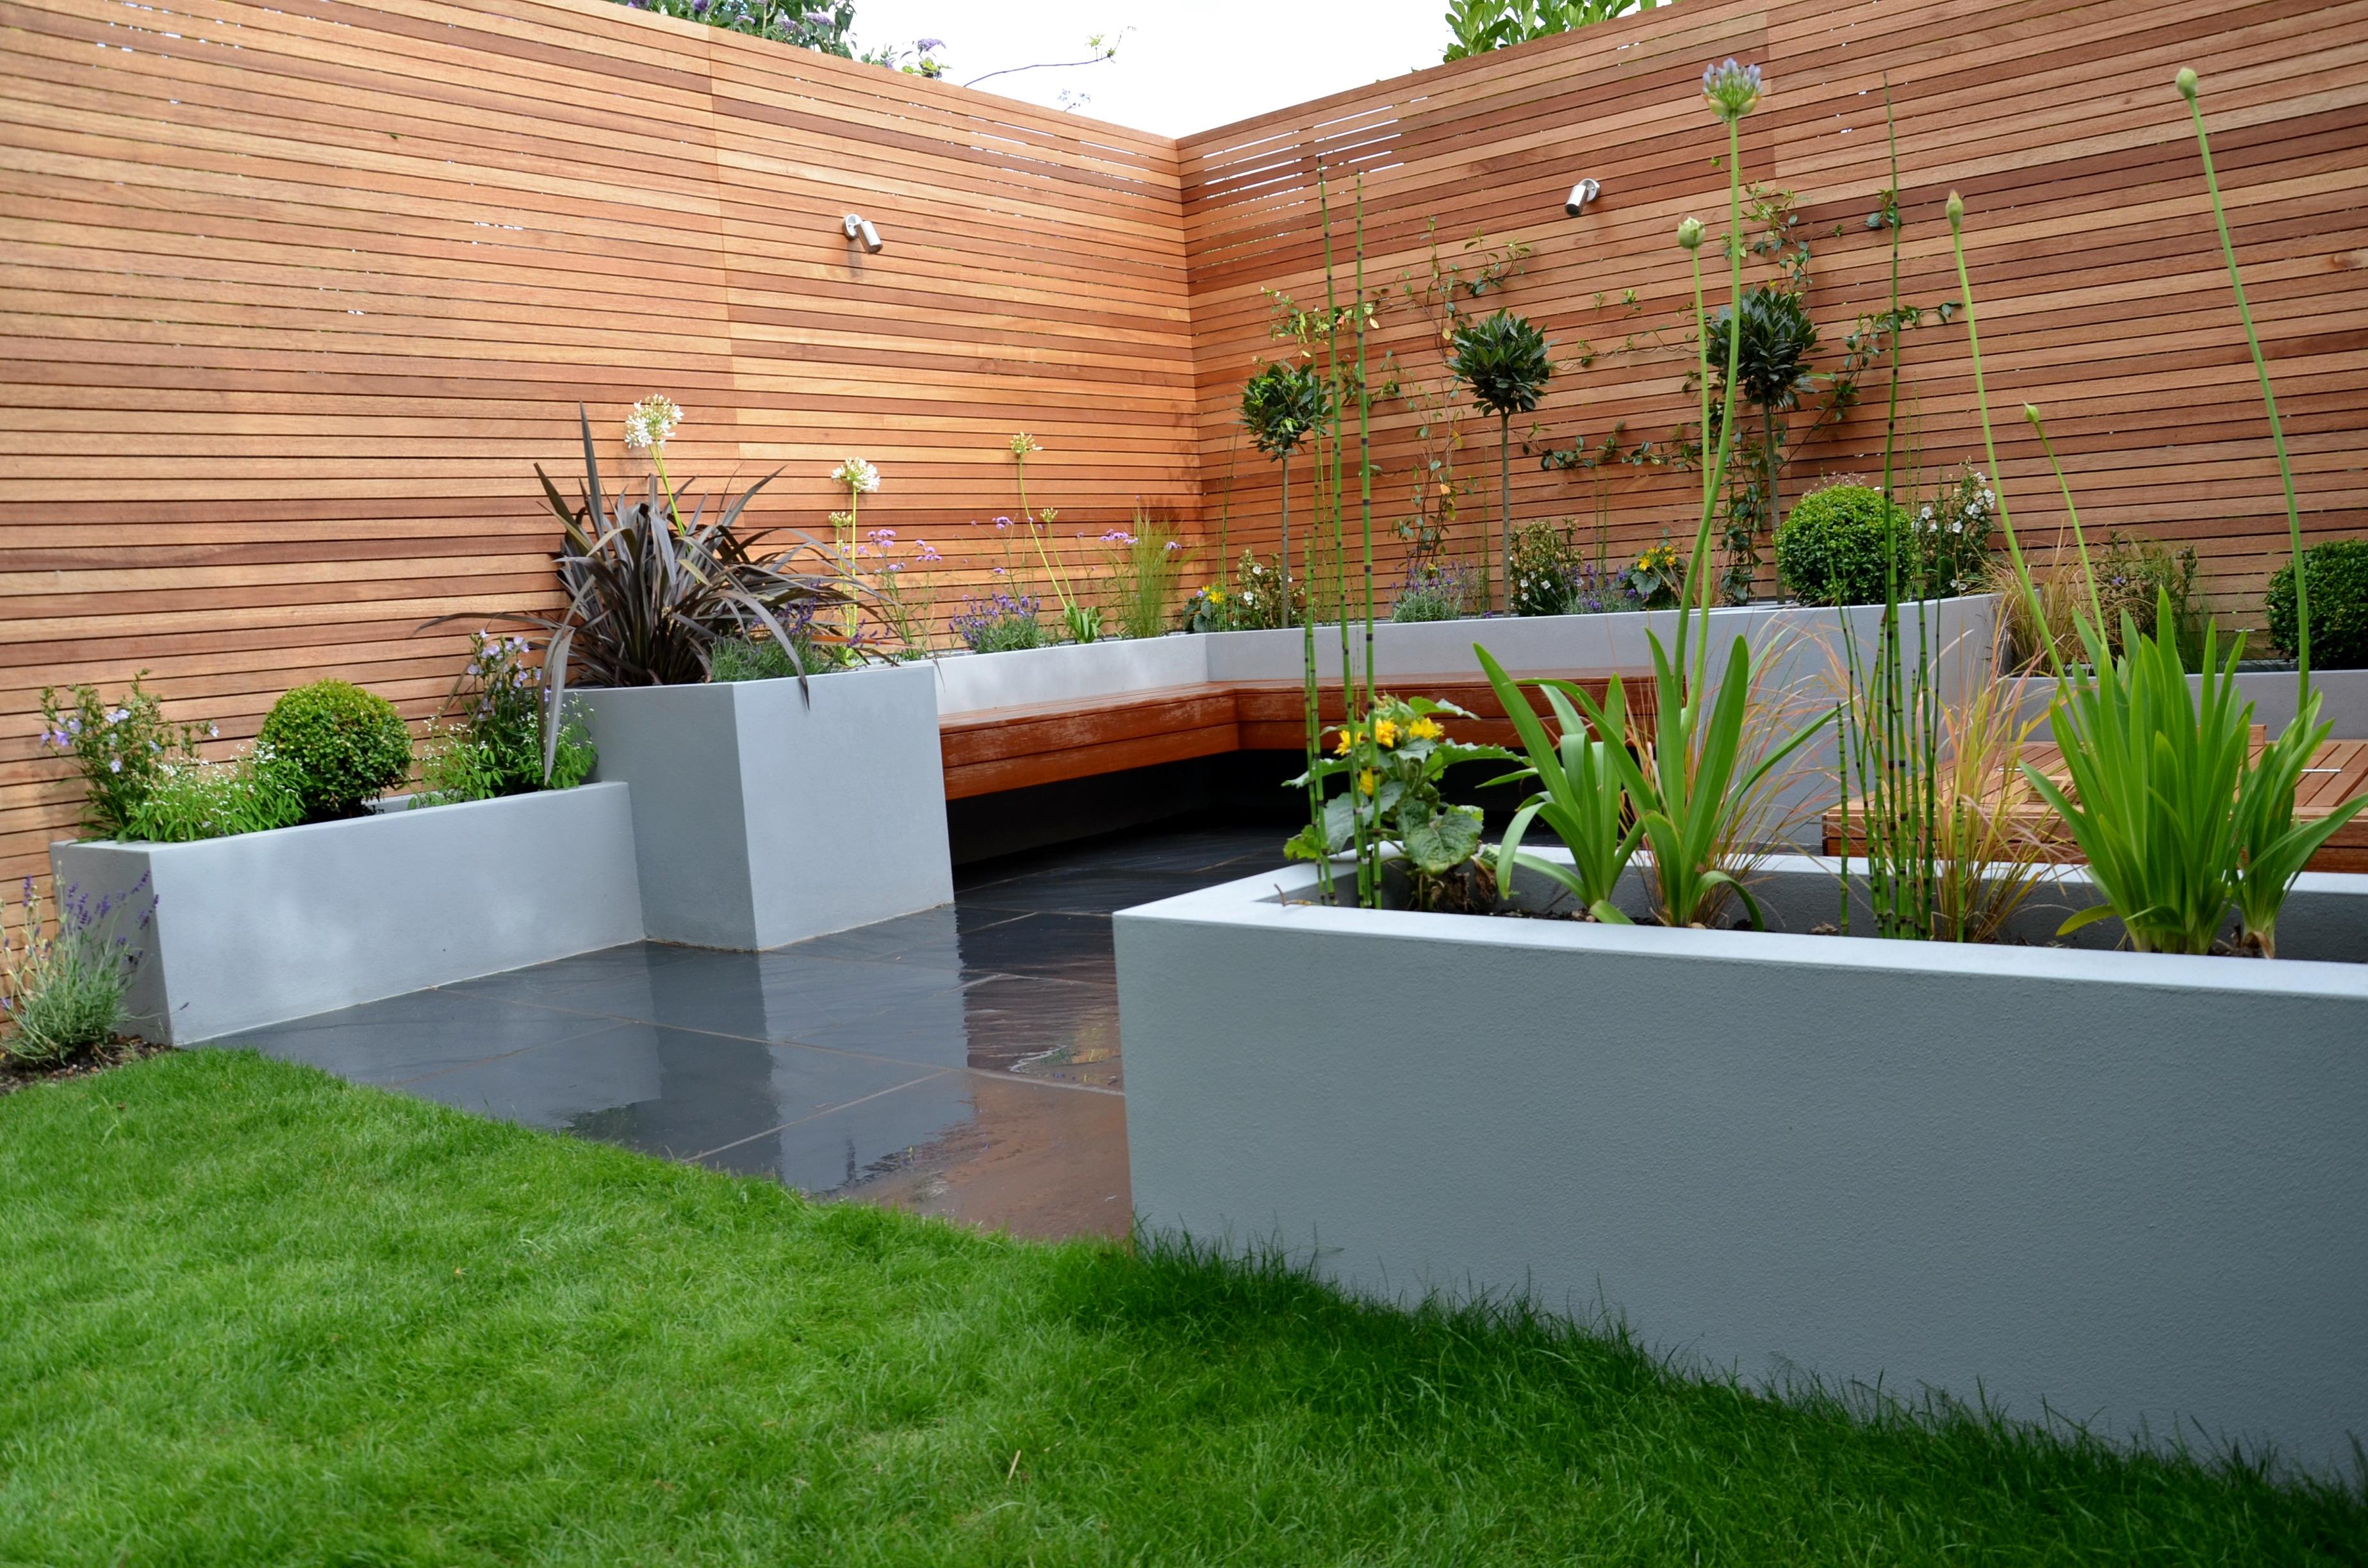 Modern Garden Design London Designer - OBSiGeN